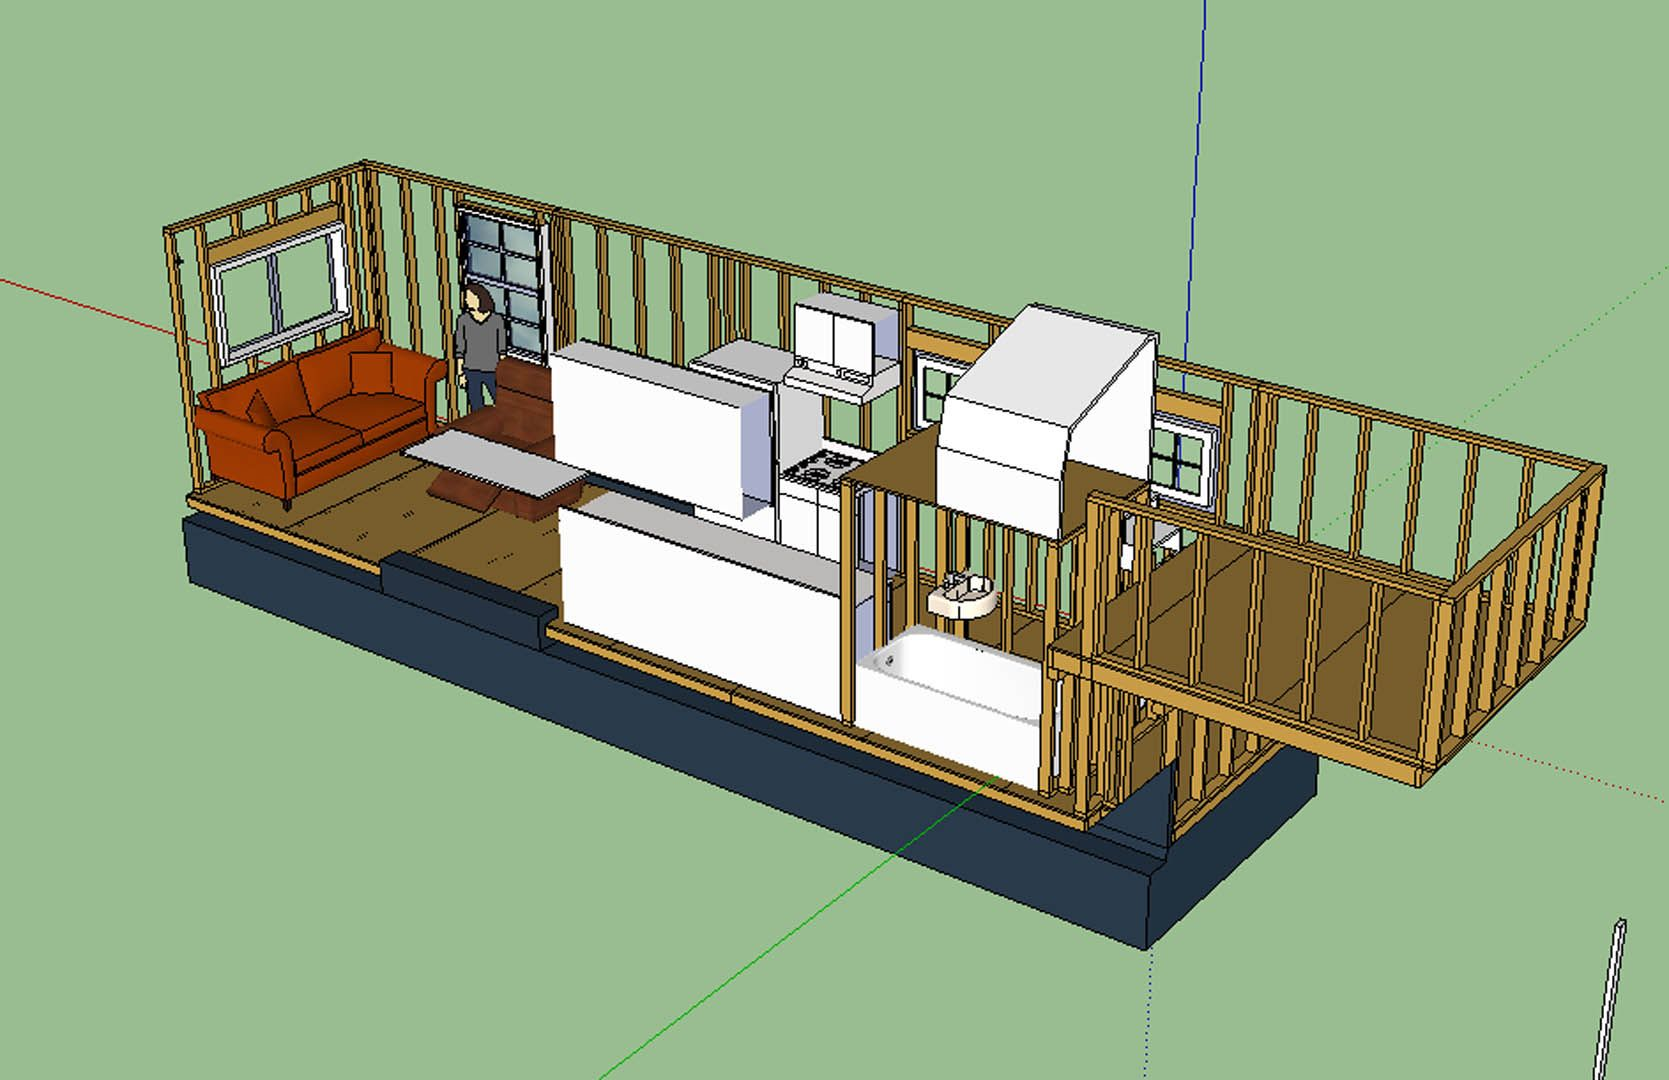 Tiny House Gooseneck Trailer House Decor Ideas Tiny House Layout Tiny House Design House Layouts